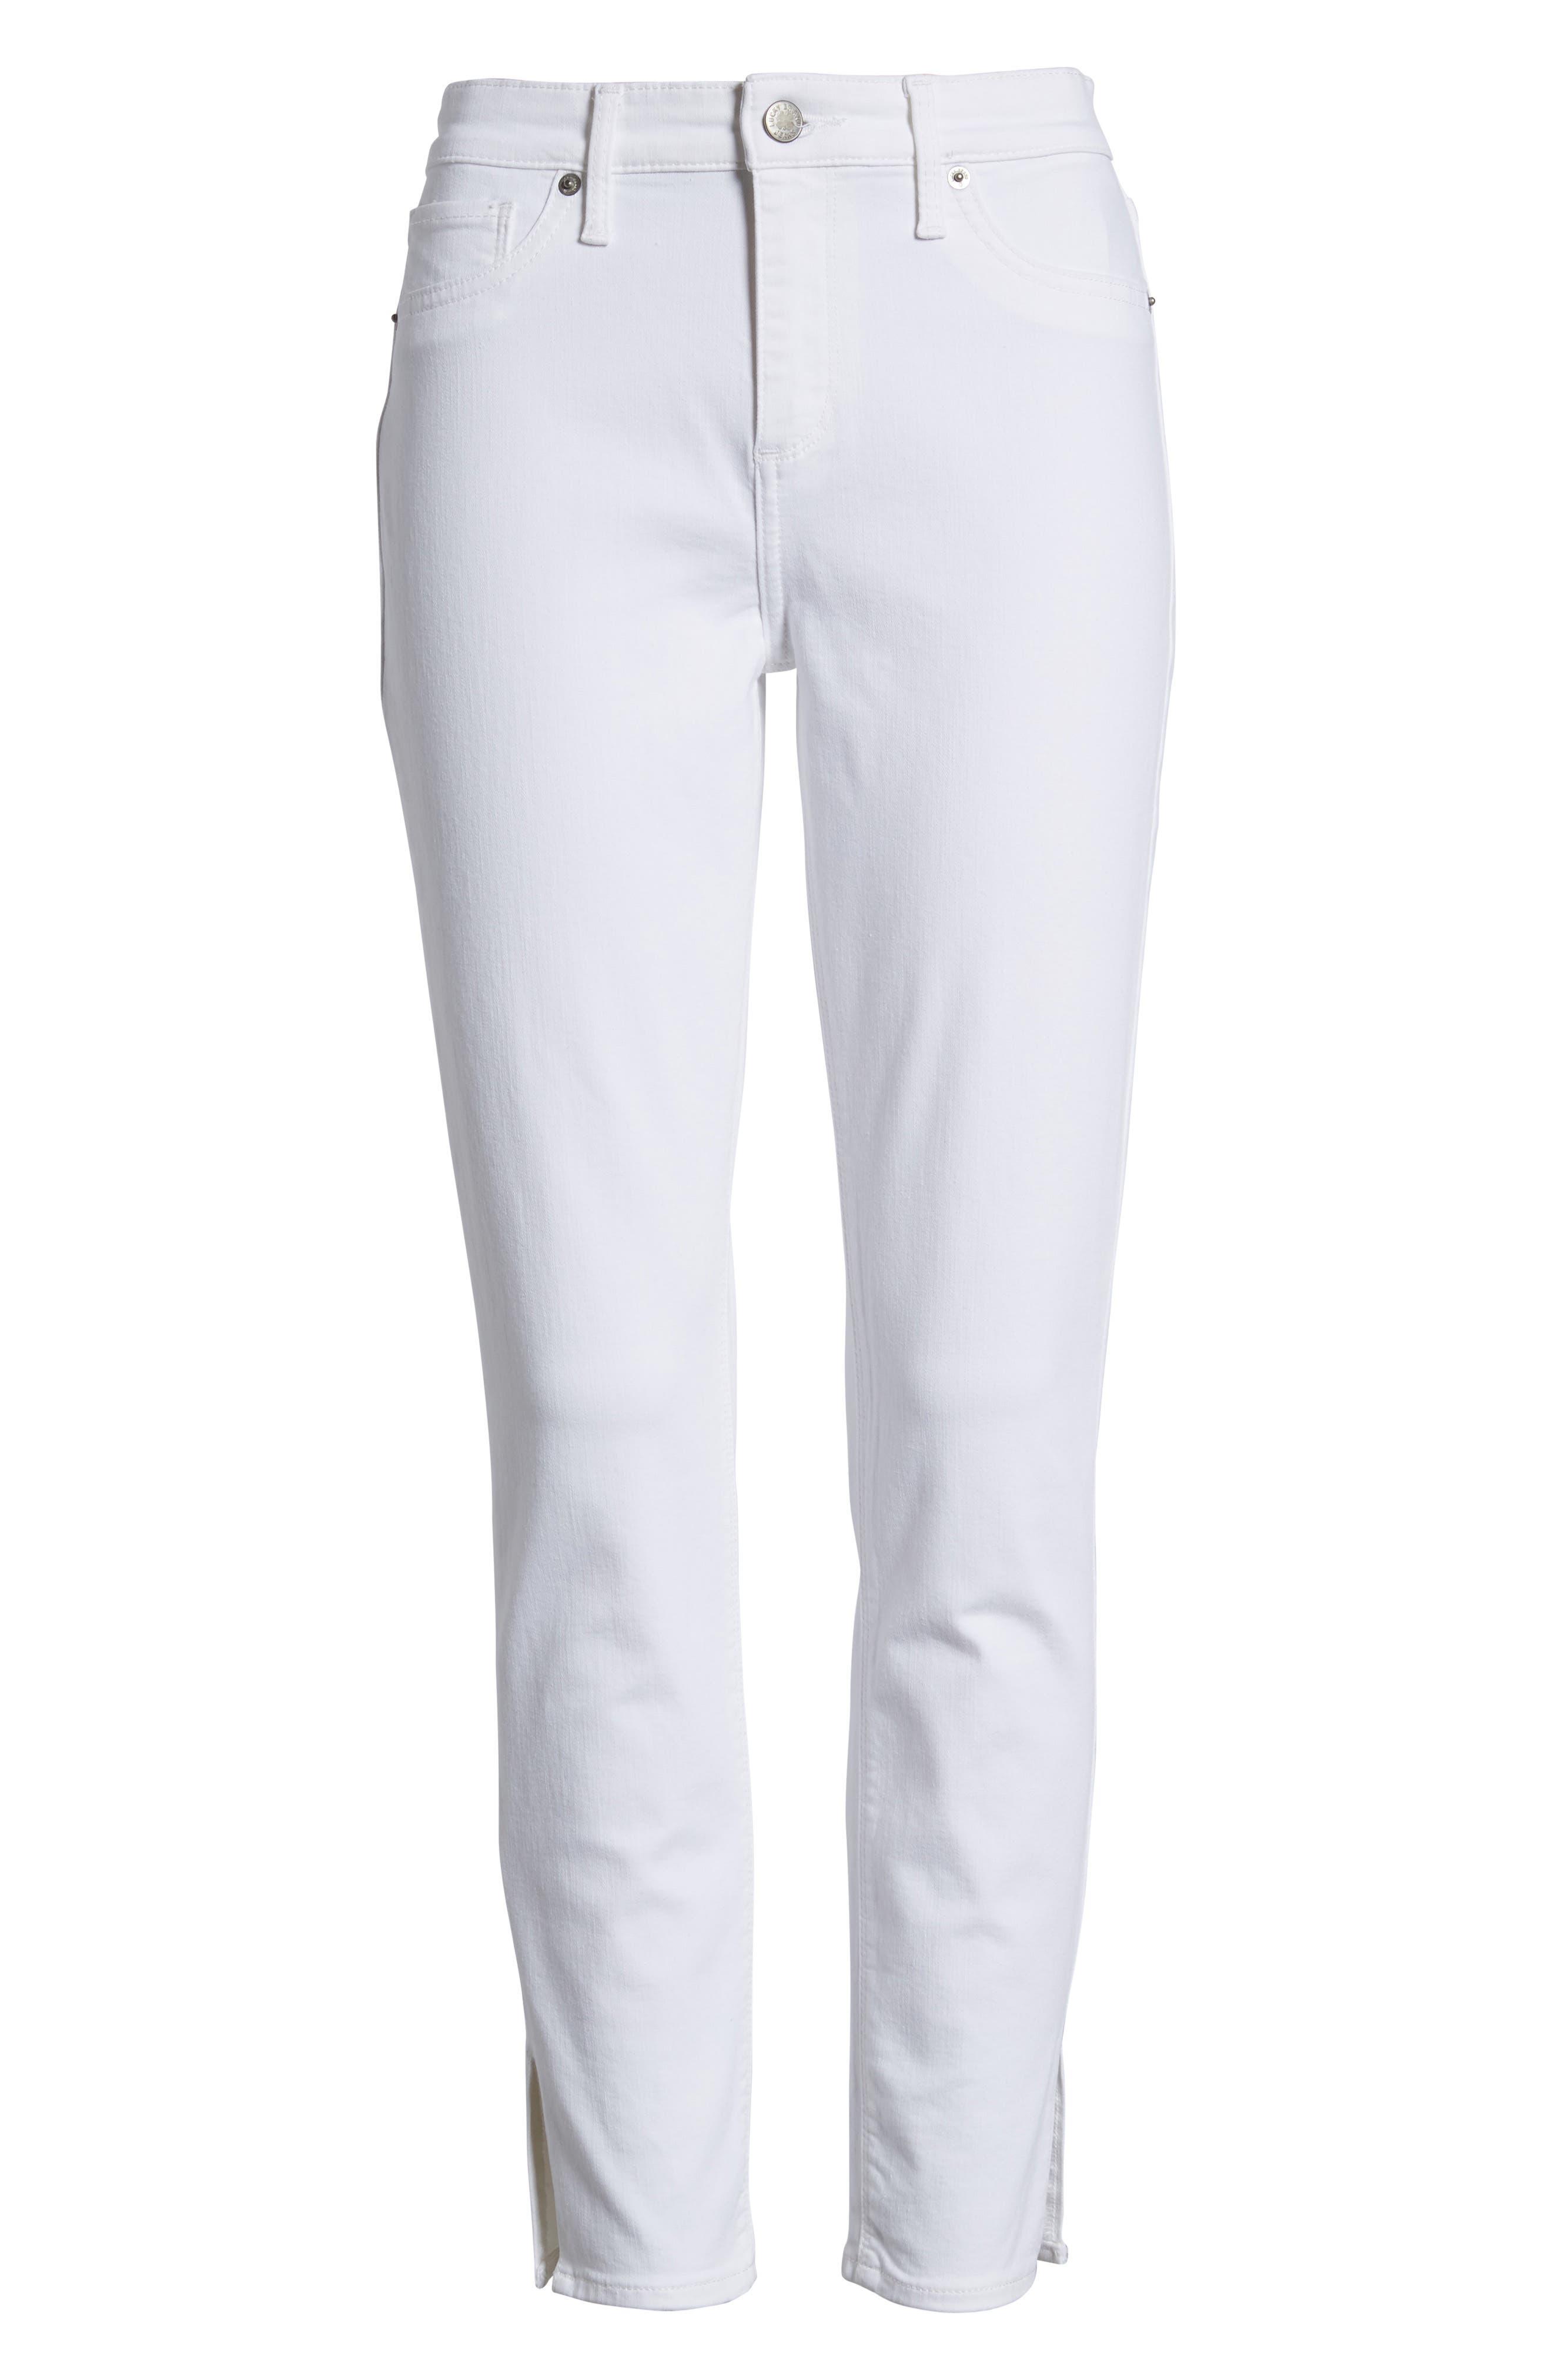 Ava Skinny White Jeans,                             Alternate thumbnail 7, color,                             Clean White